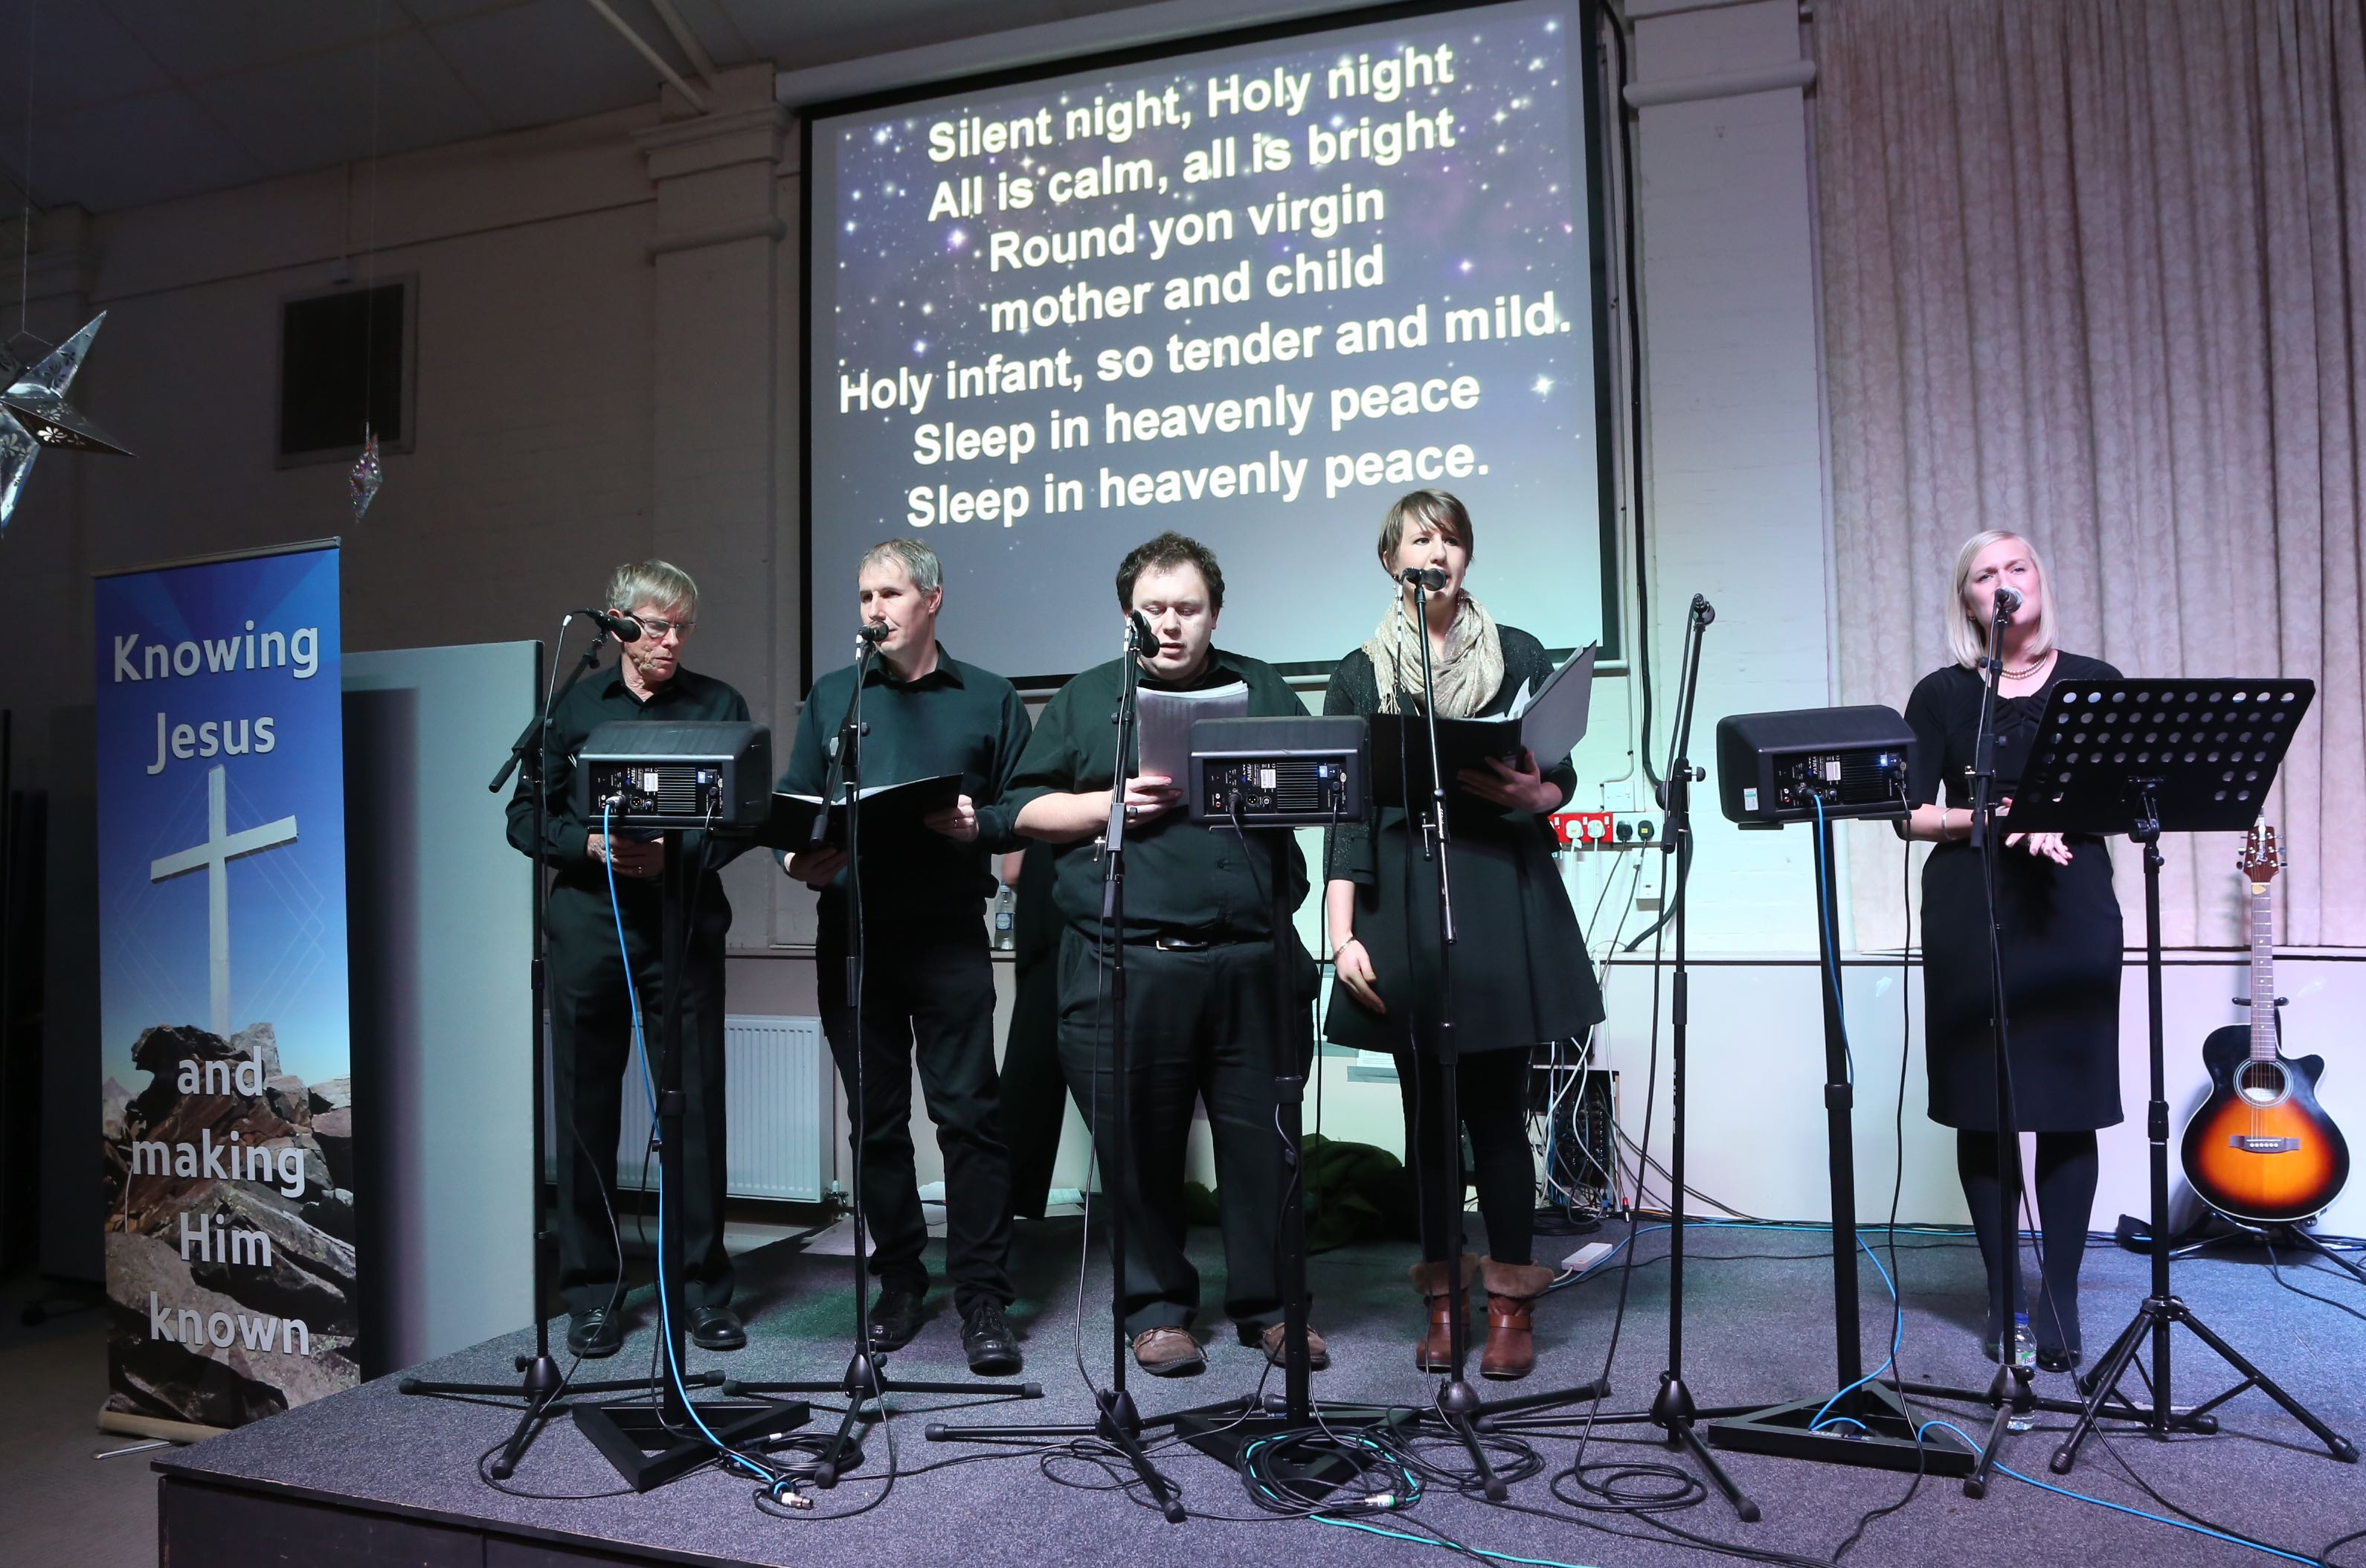 Barnabas Community Church choir led the carol singers